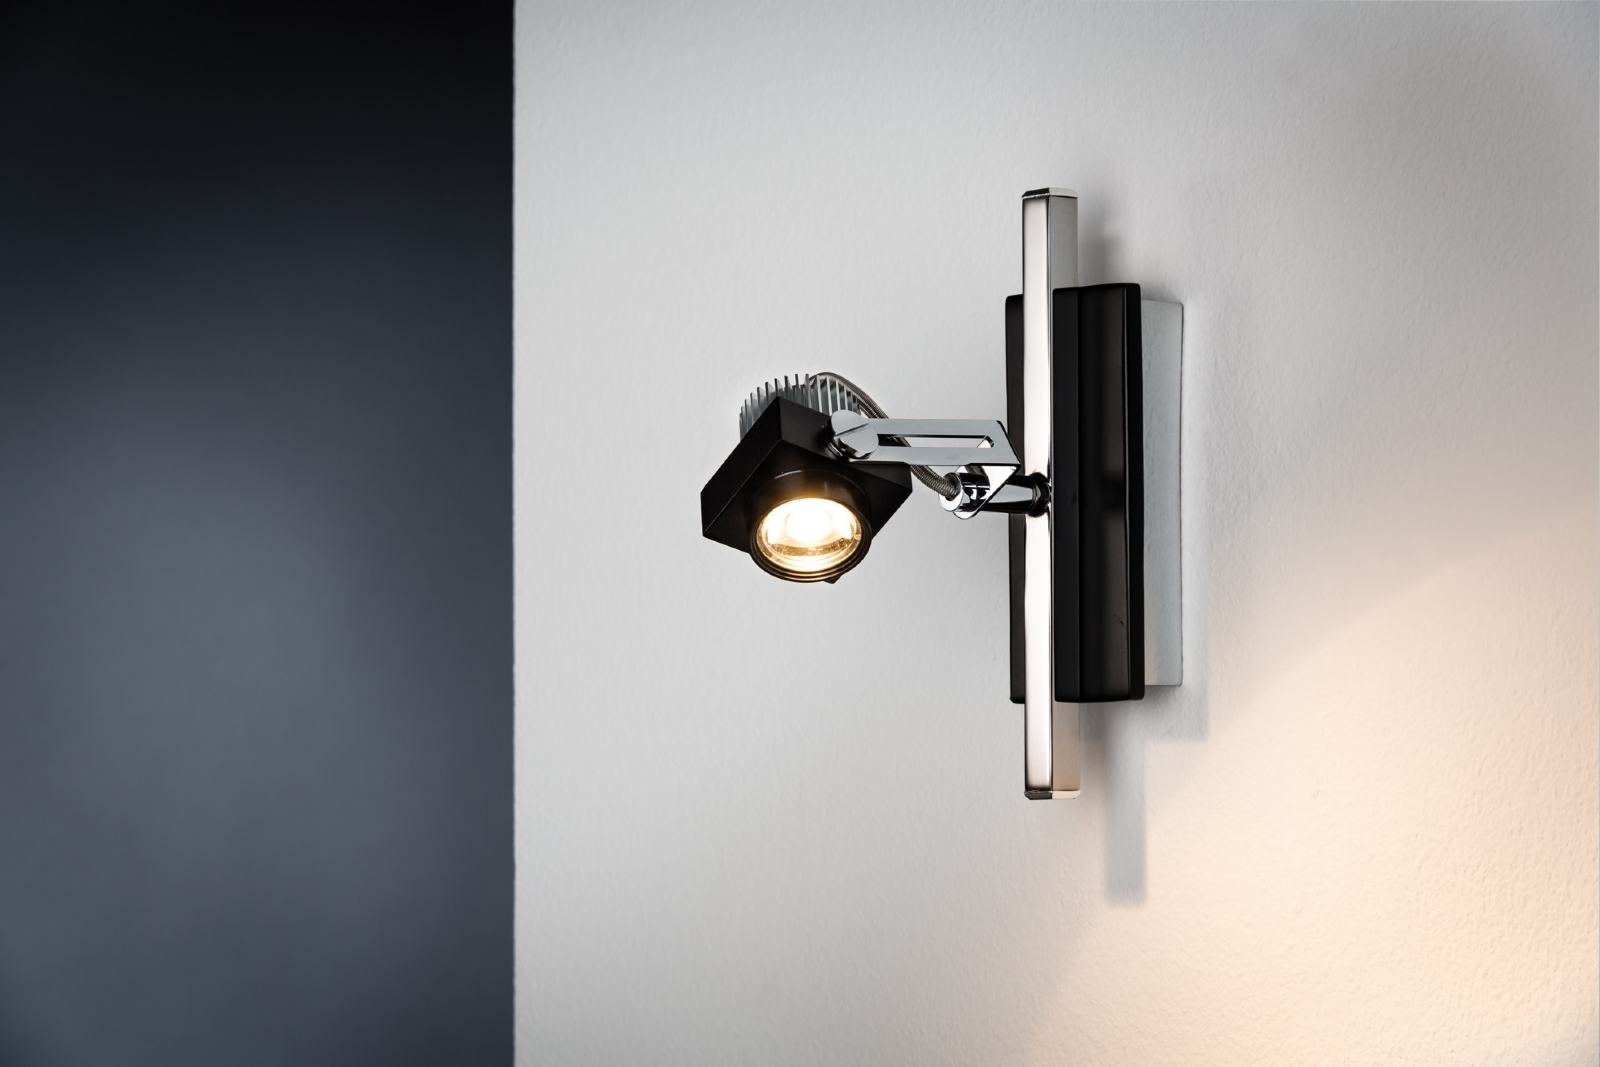 Led Adjustable Wall Spot Light